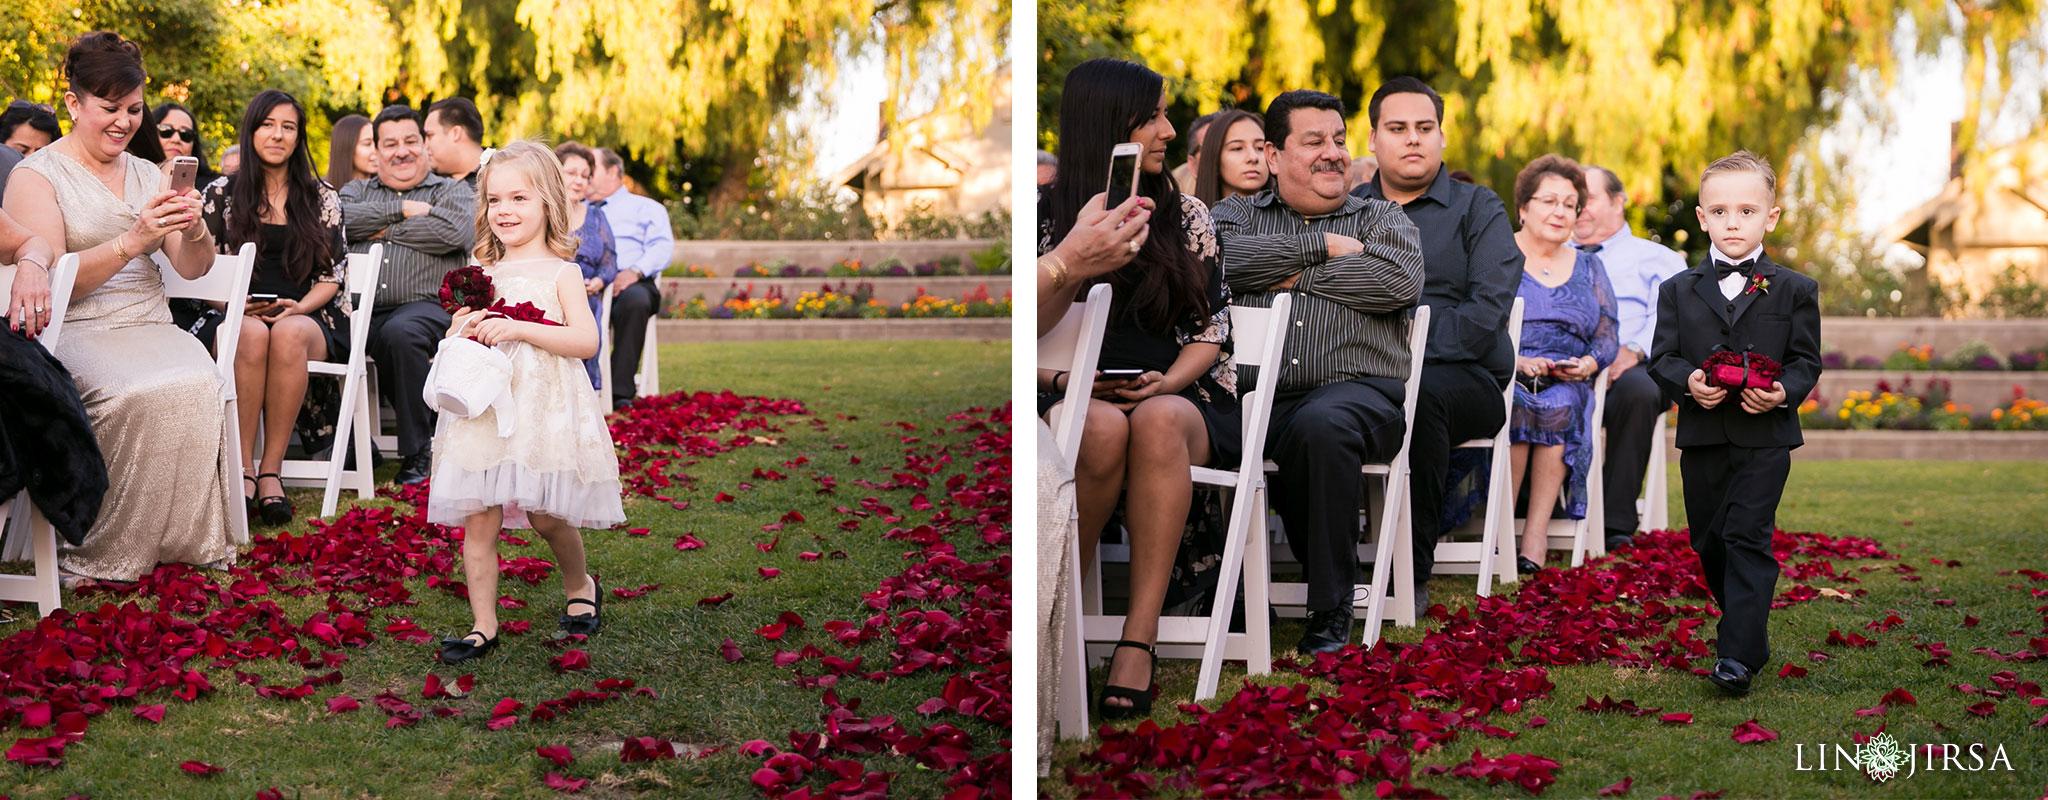 13 richard nixon library wedding ceremony photography